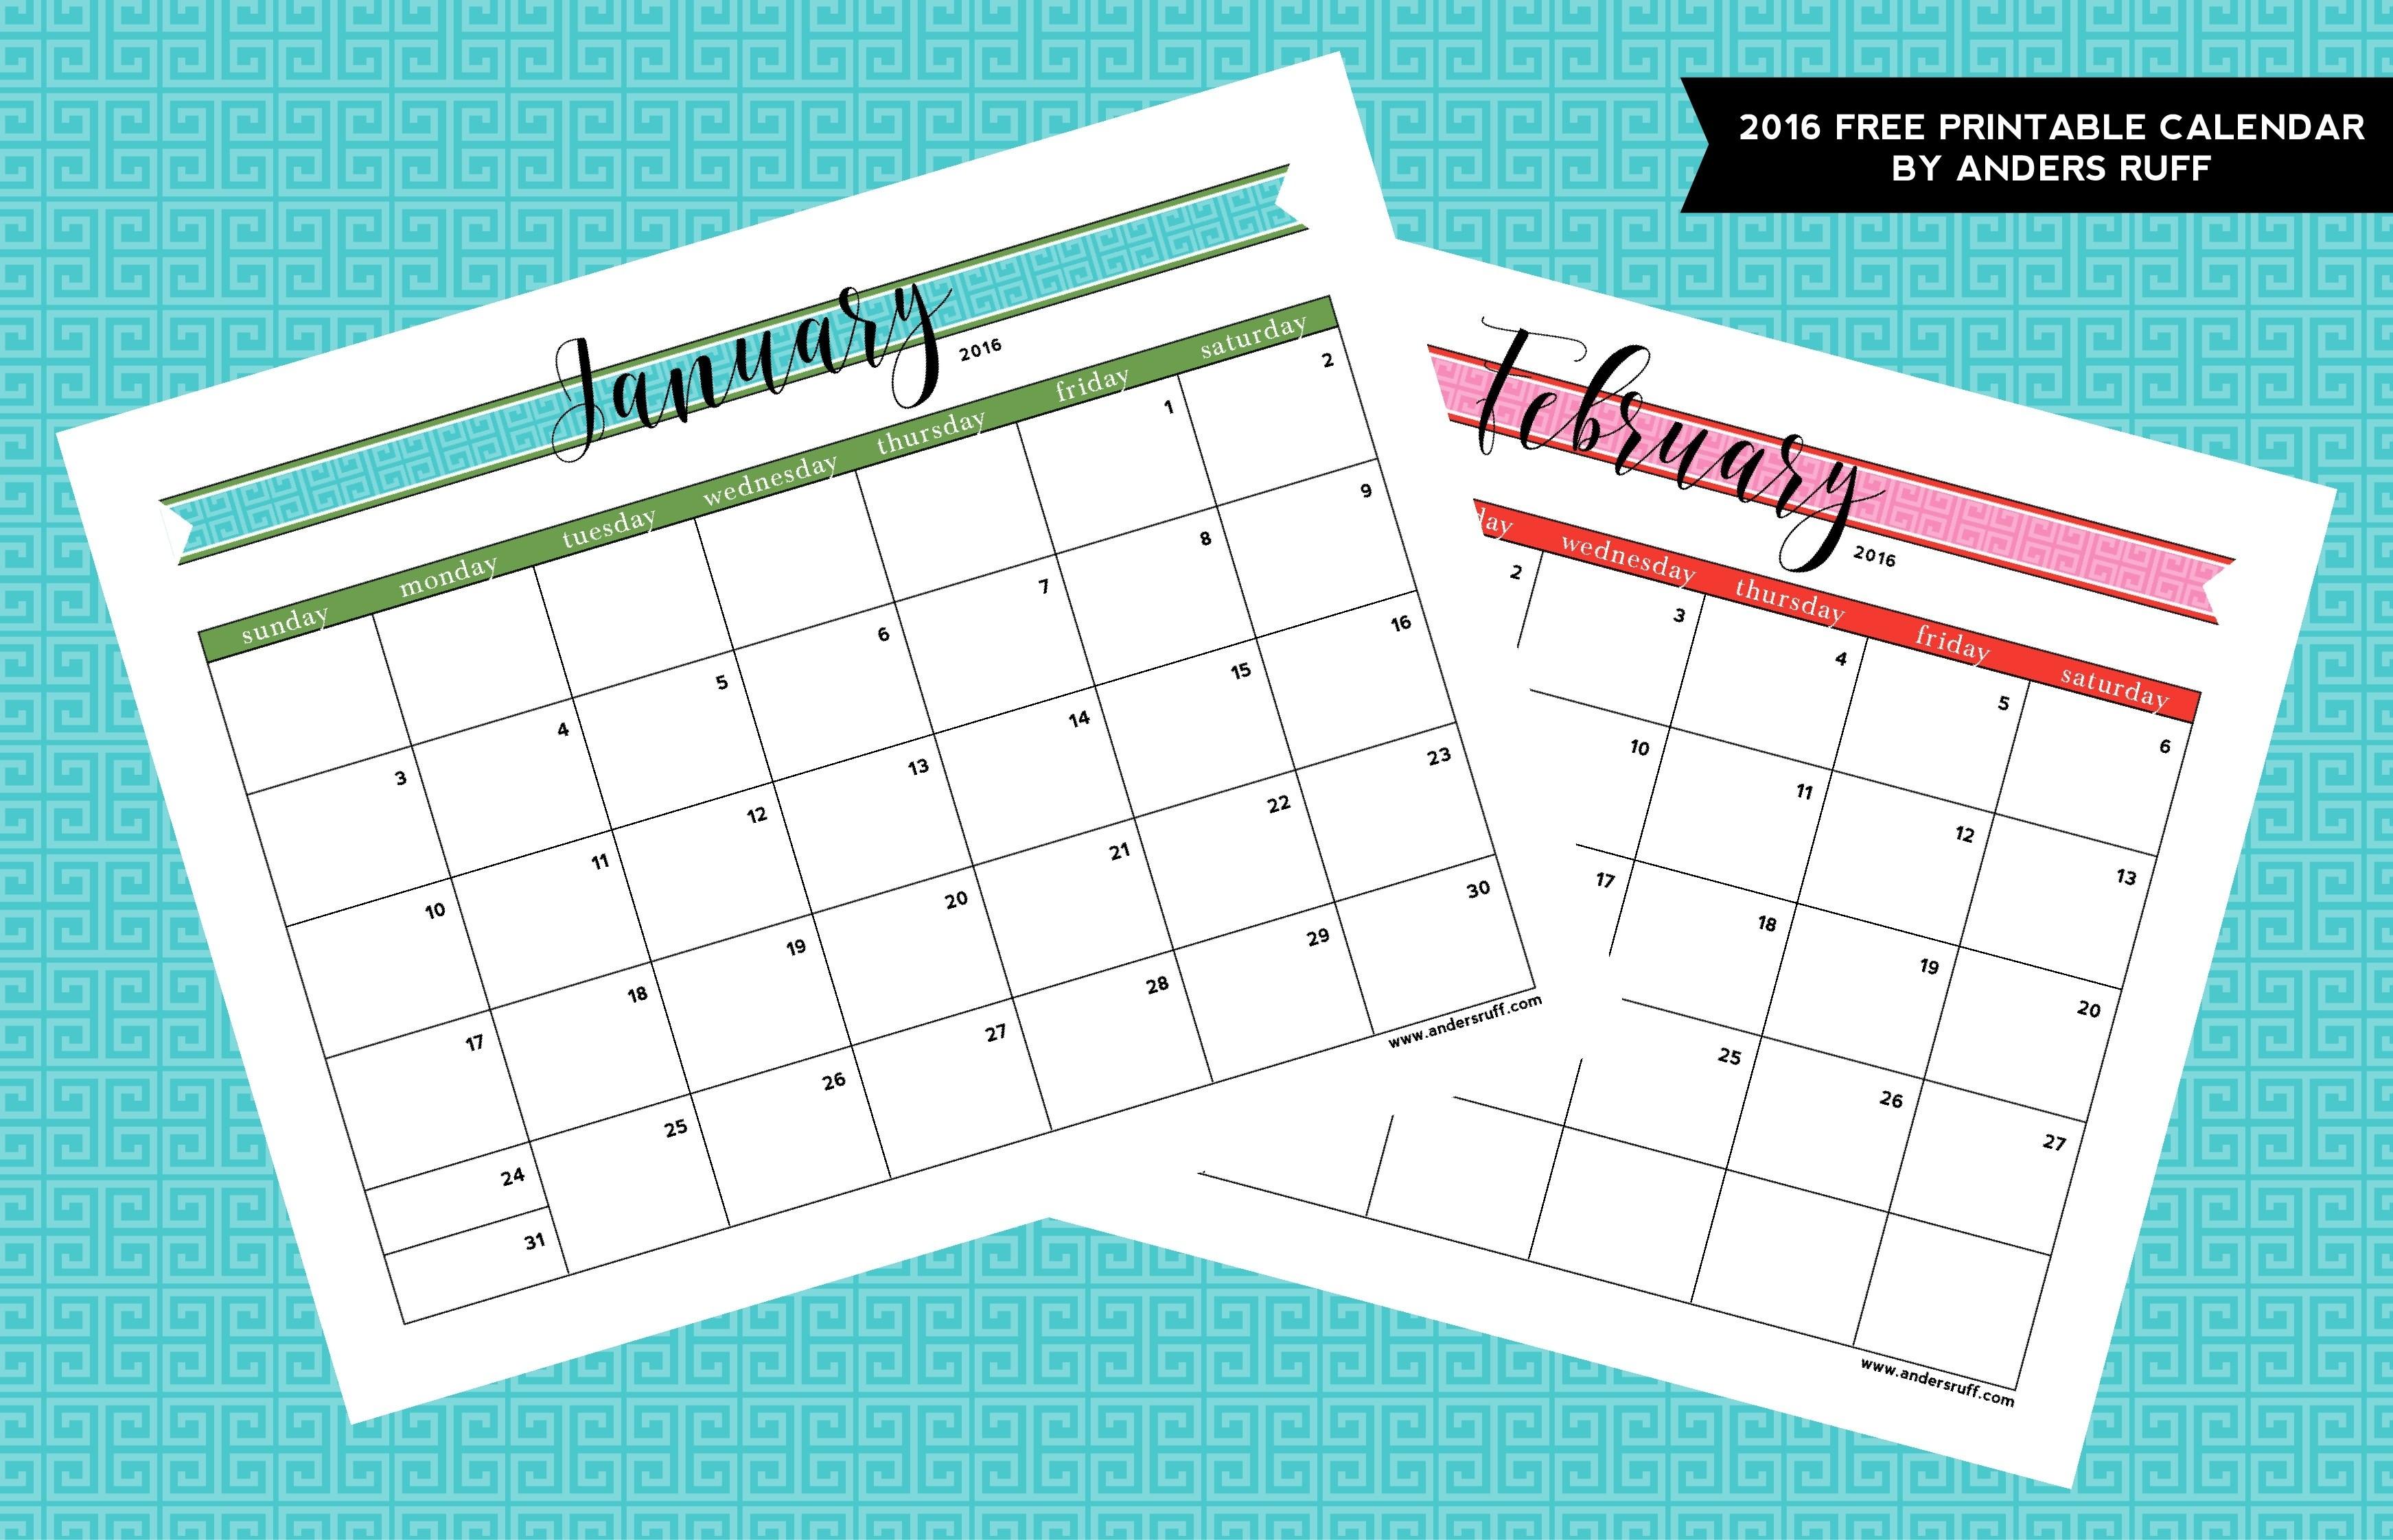 Free Printable Customizable Calendar Free Customizable Printable Calendar